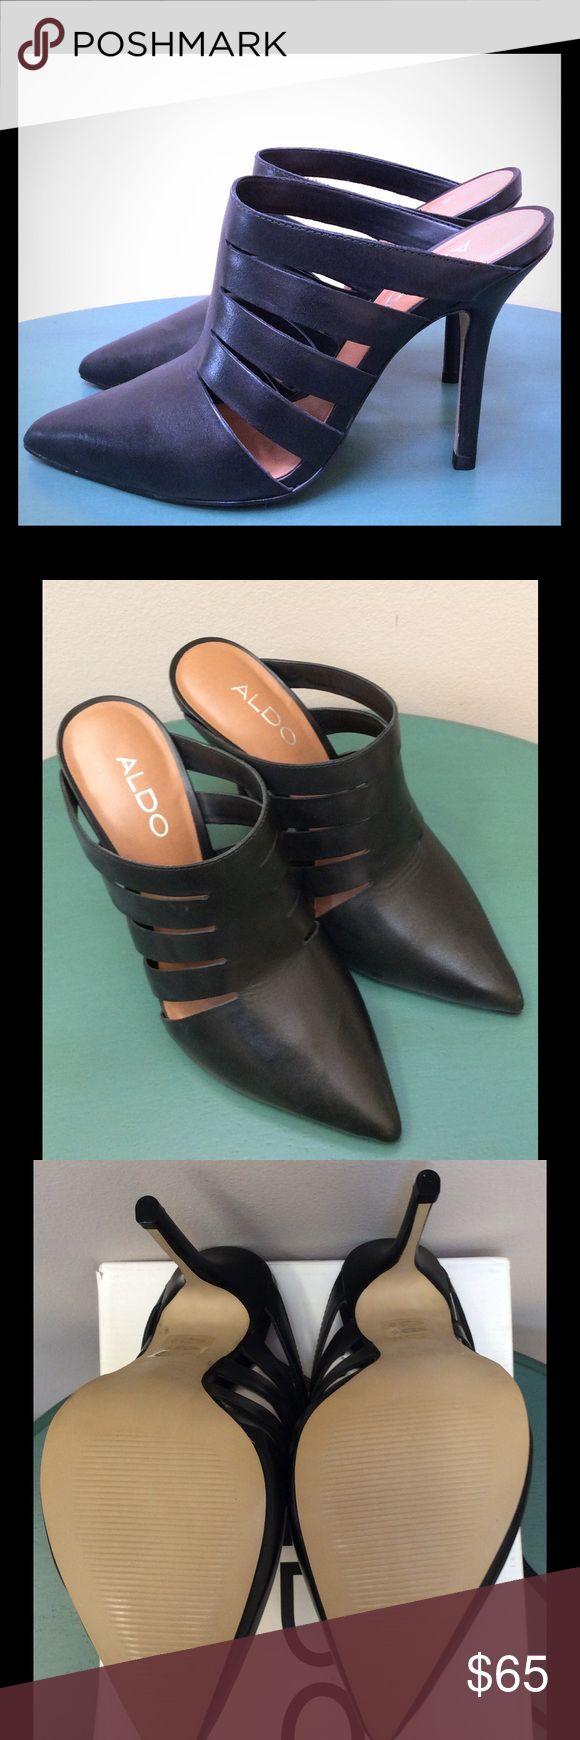 Women's Black Aldo Heel Mules *Never Worn* Black Aldo Heeled Mules size 6 Aldo Shoes Mules & Clogs